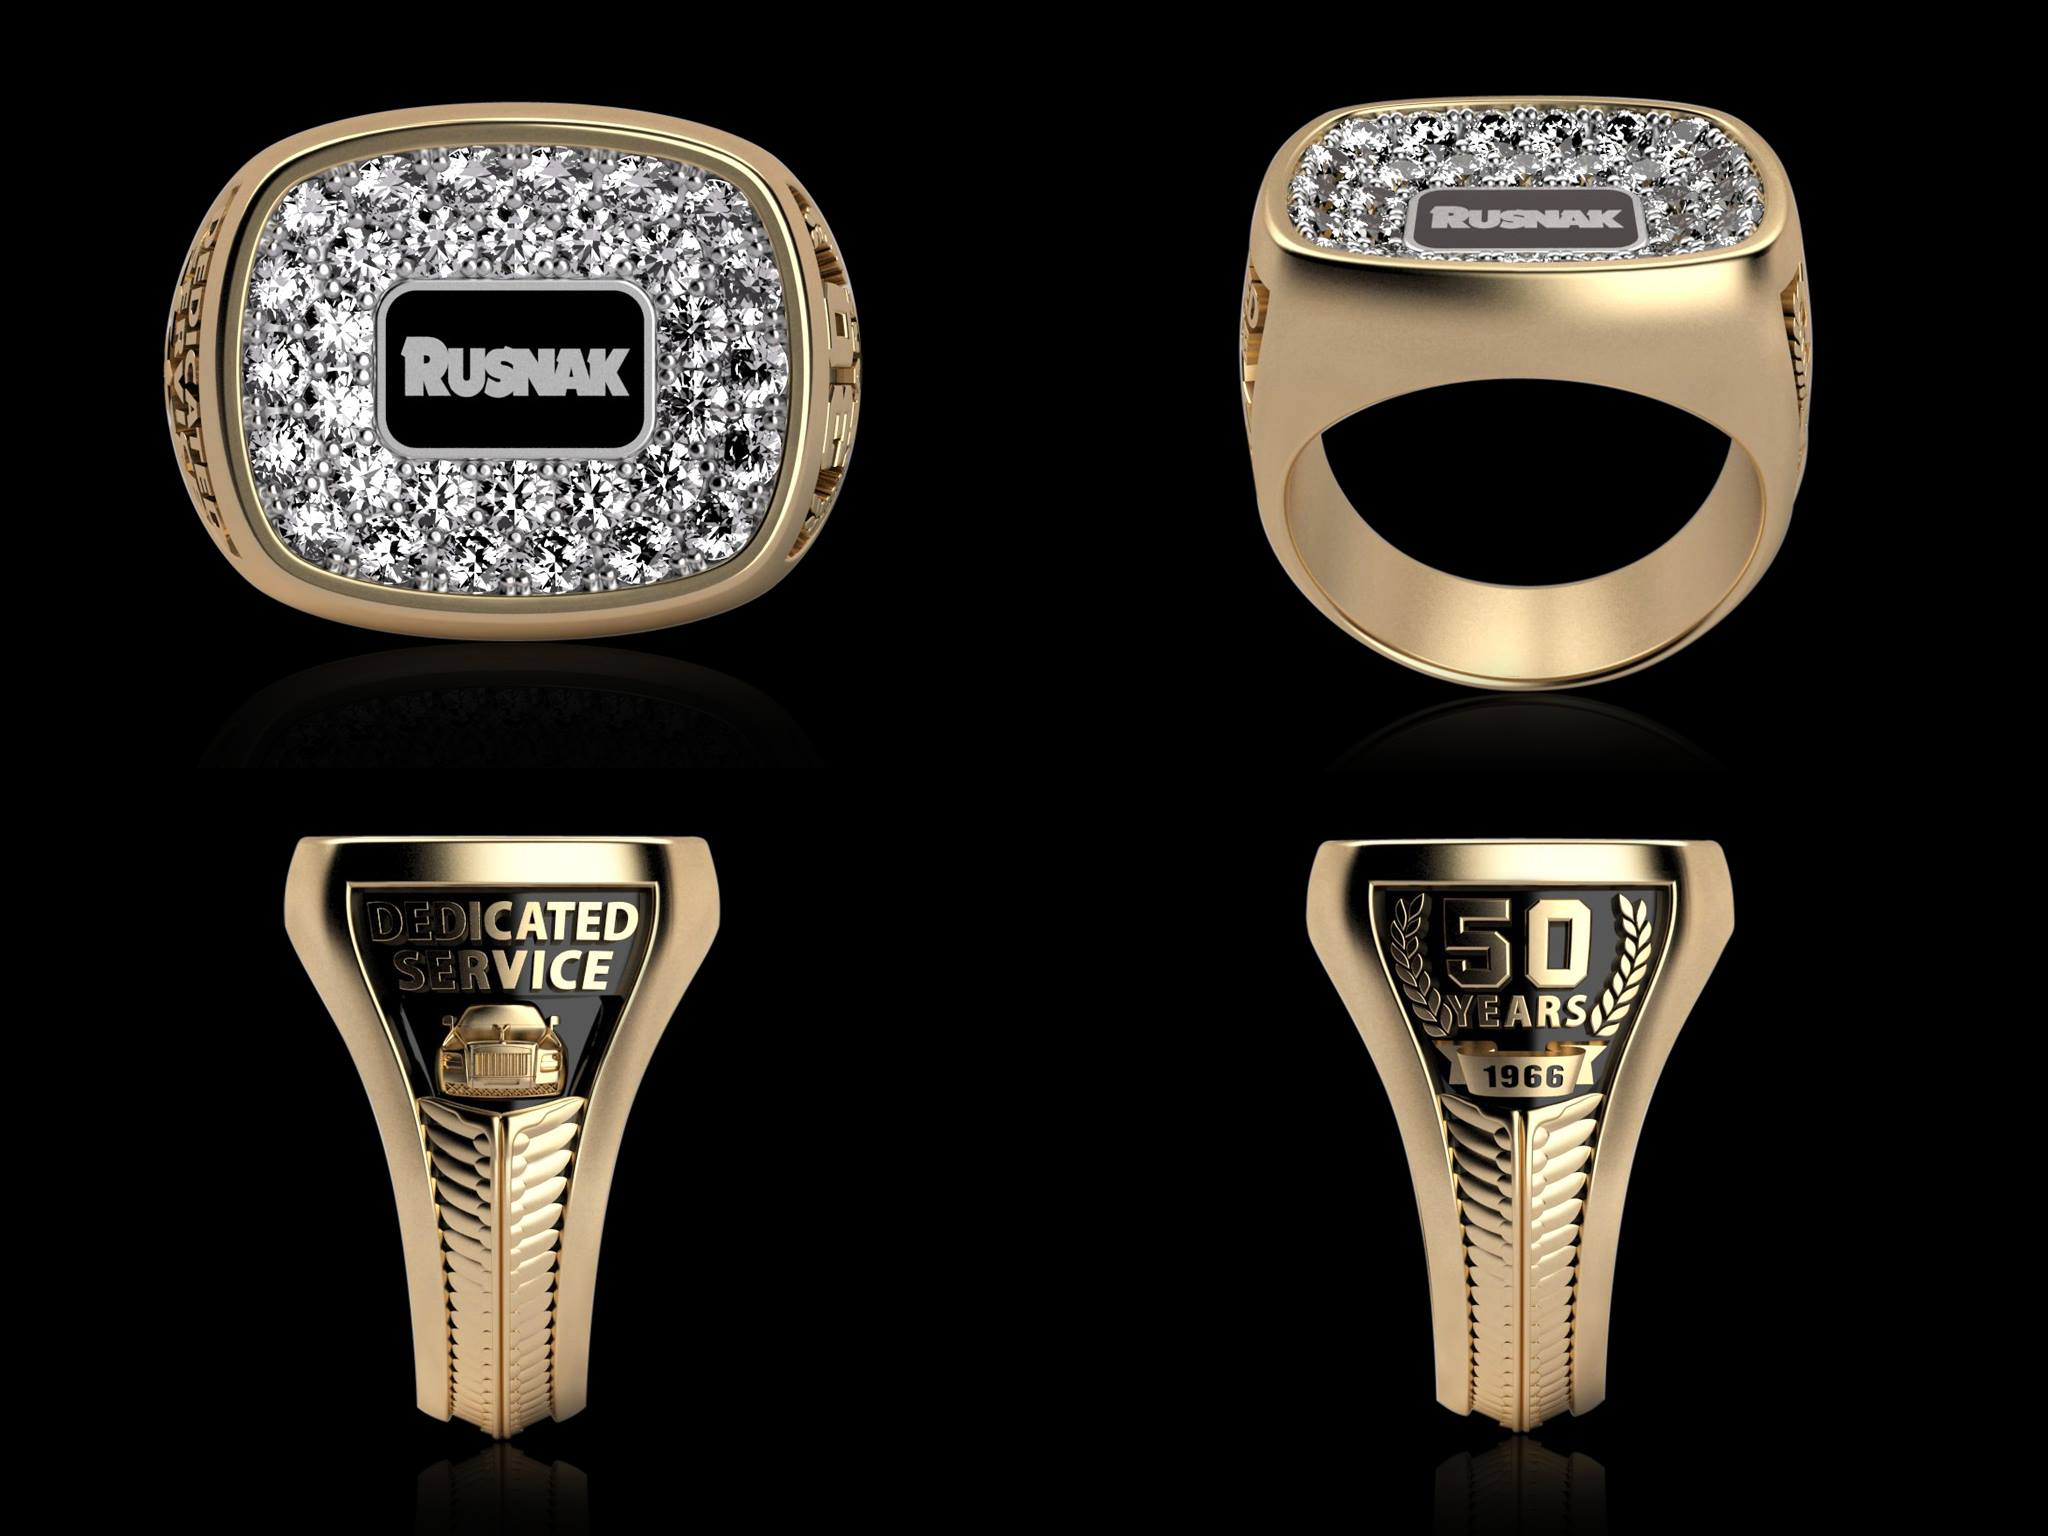 The Rusnak Diamond Ring